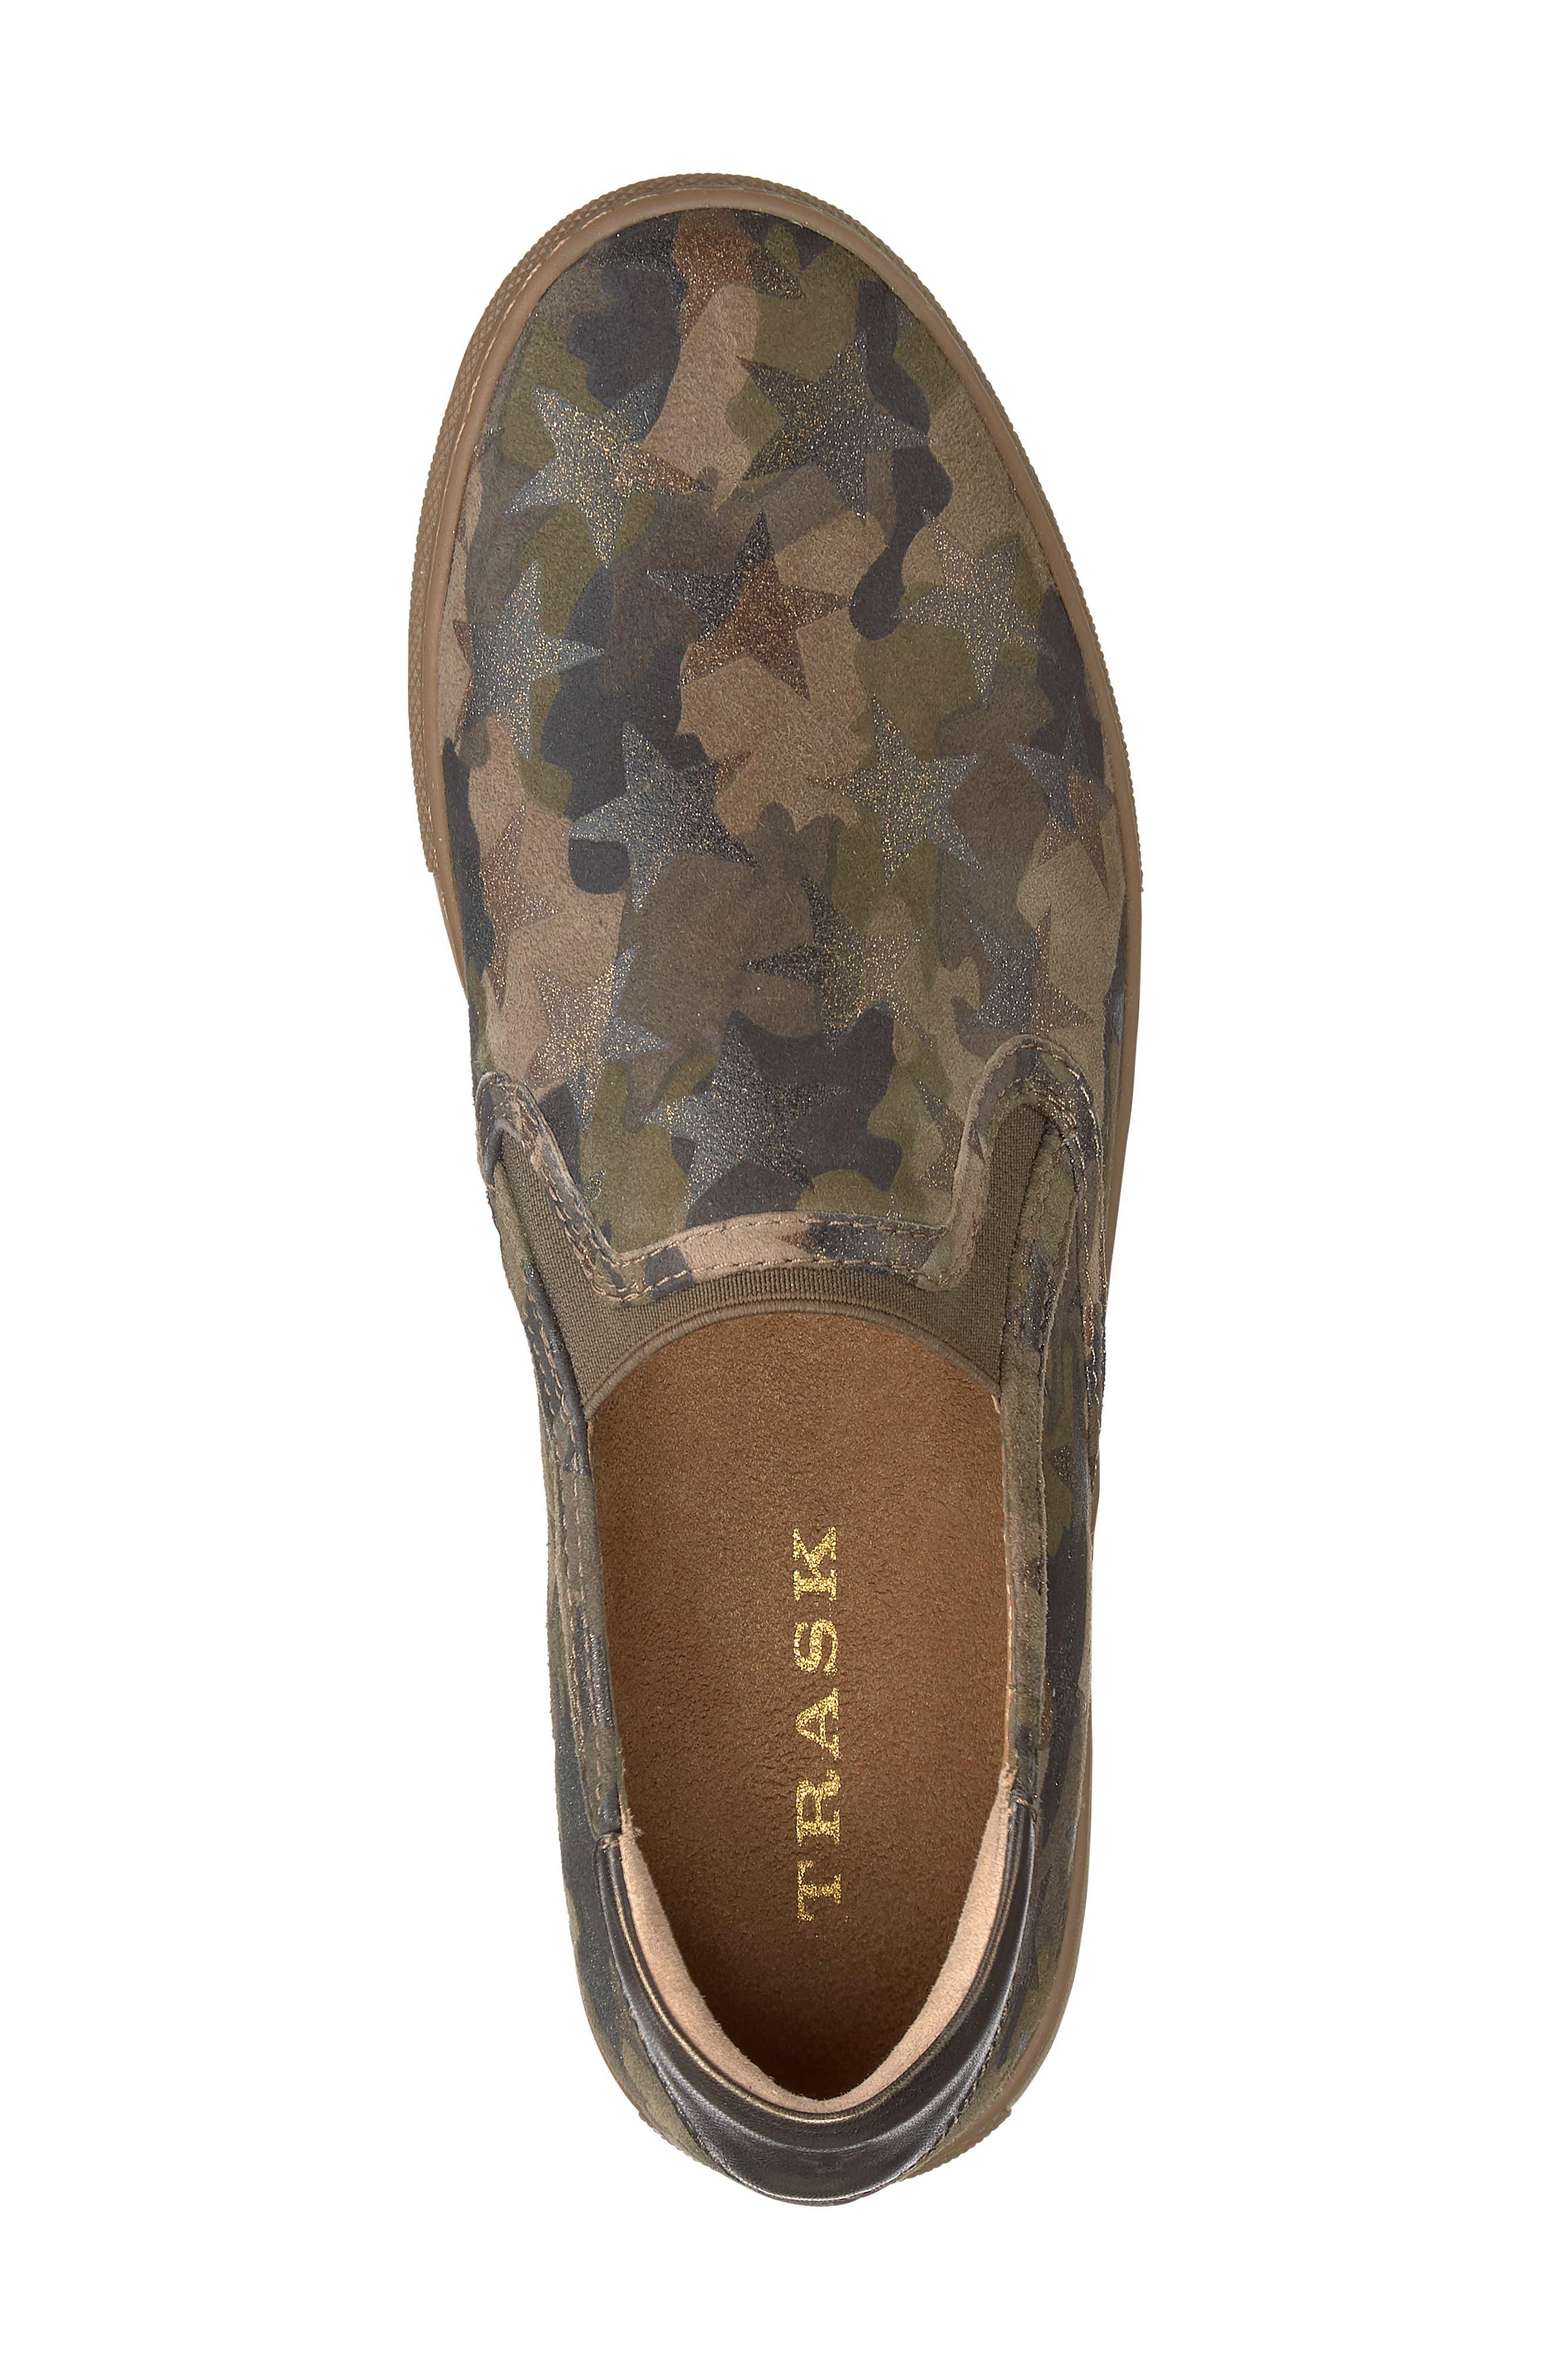 Lillian Water Resistant Slip-On Sneaker,                             Alternate thumbnail 5, color,                             OLIVE STAR PRINT SUEDE